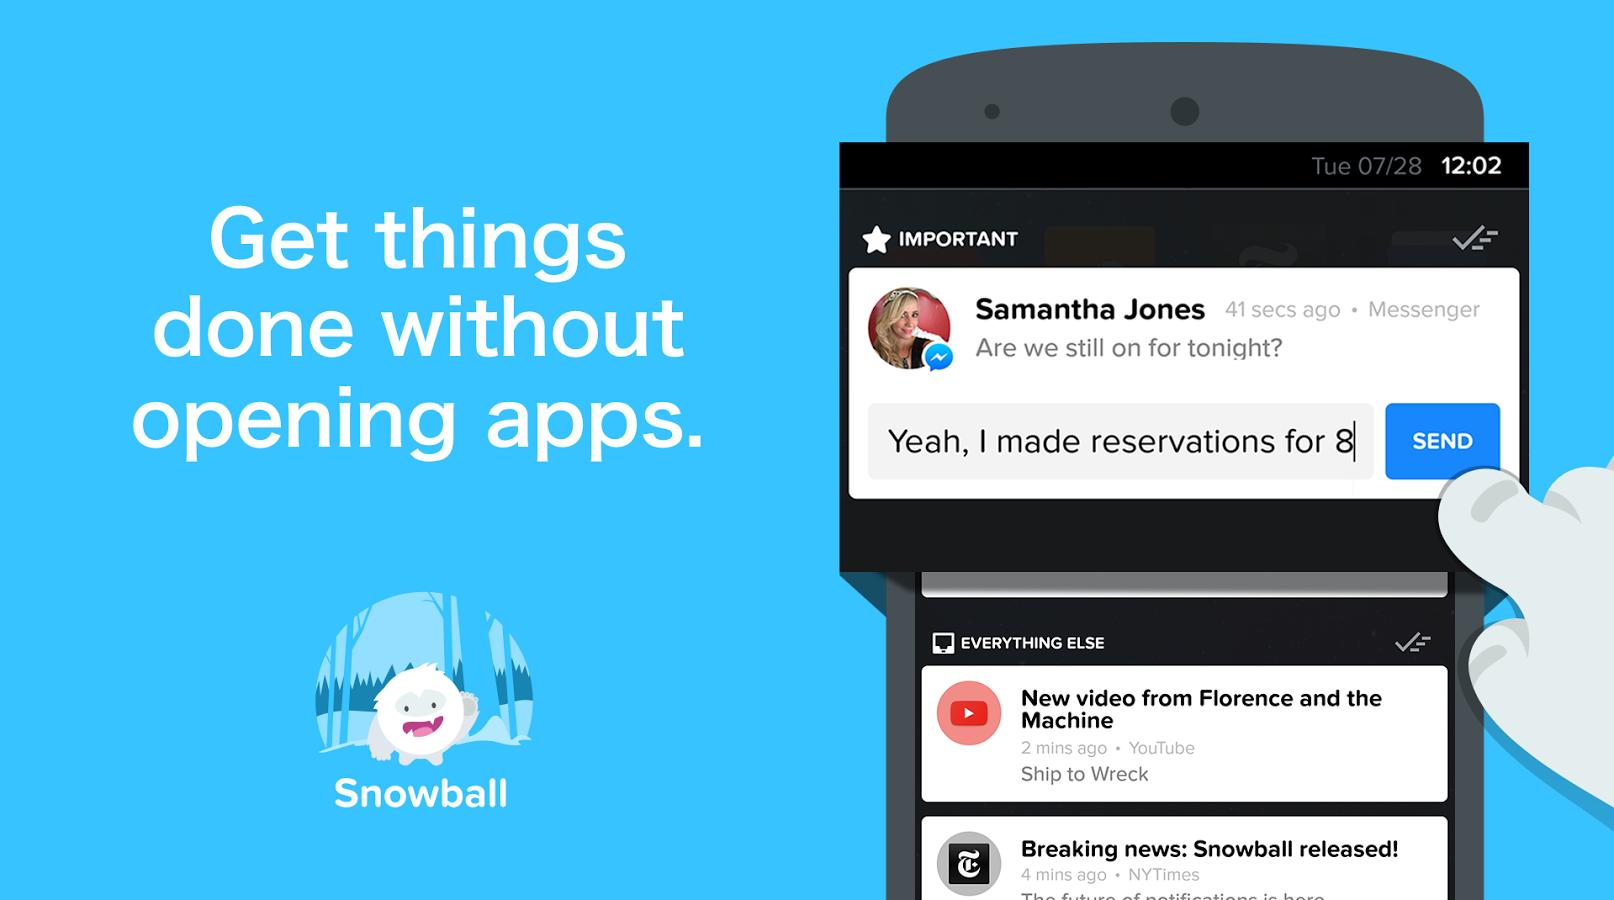 Snowball1